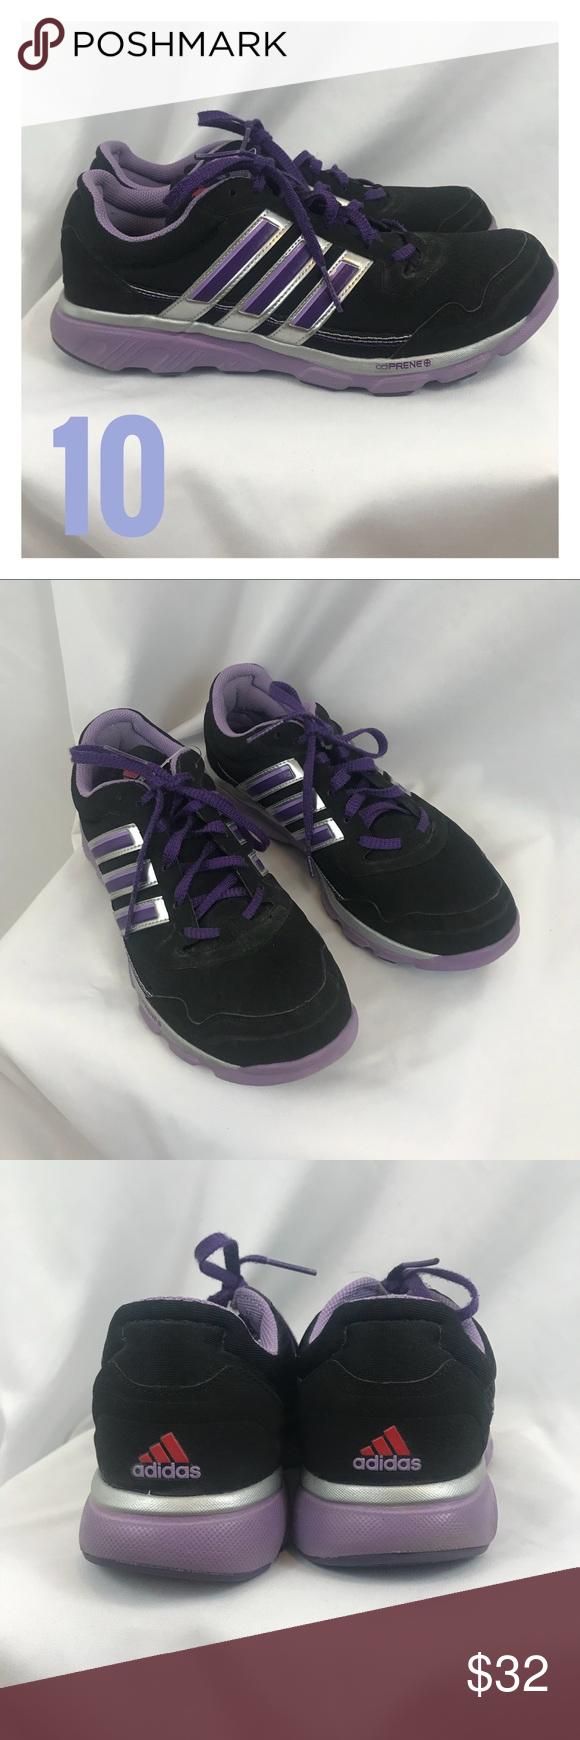 Adidas Shoes  Rockport Adiprene By Addidas Purple Women